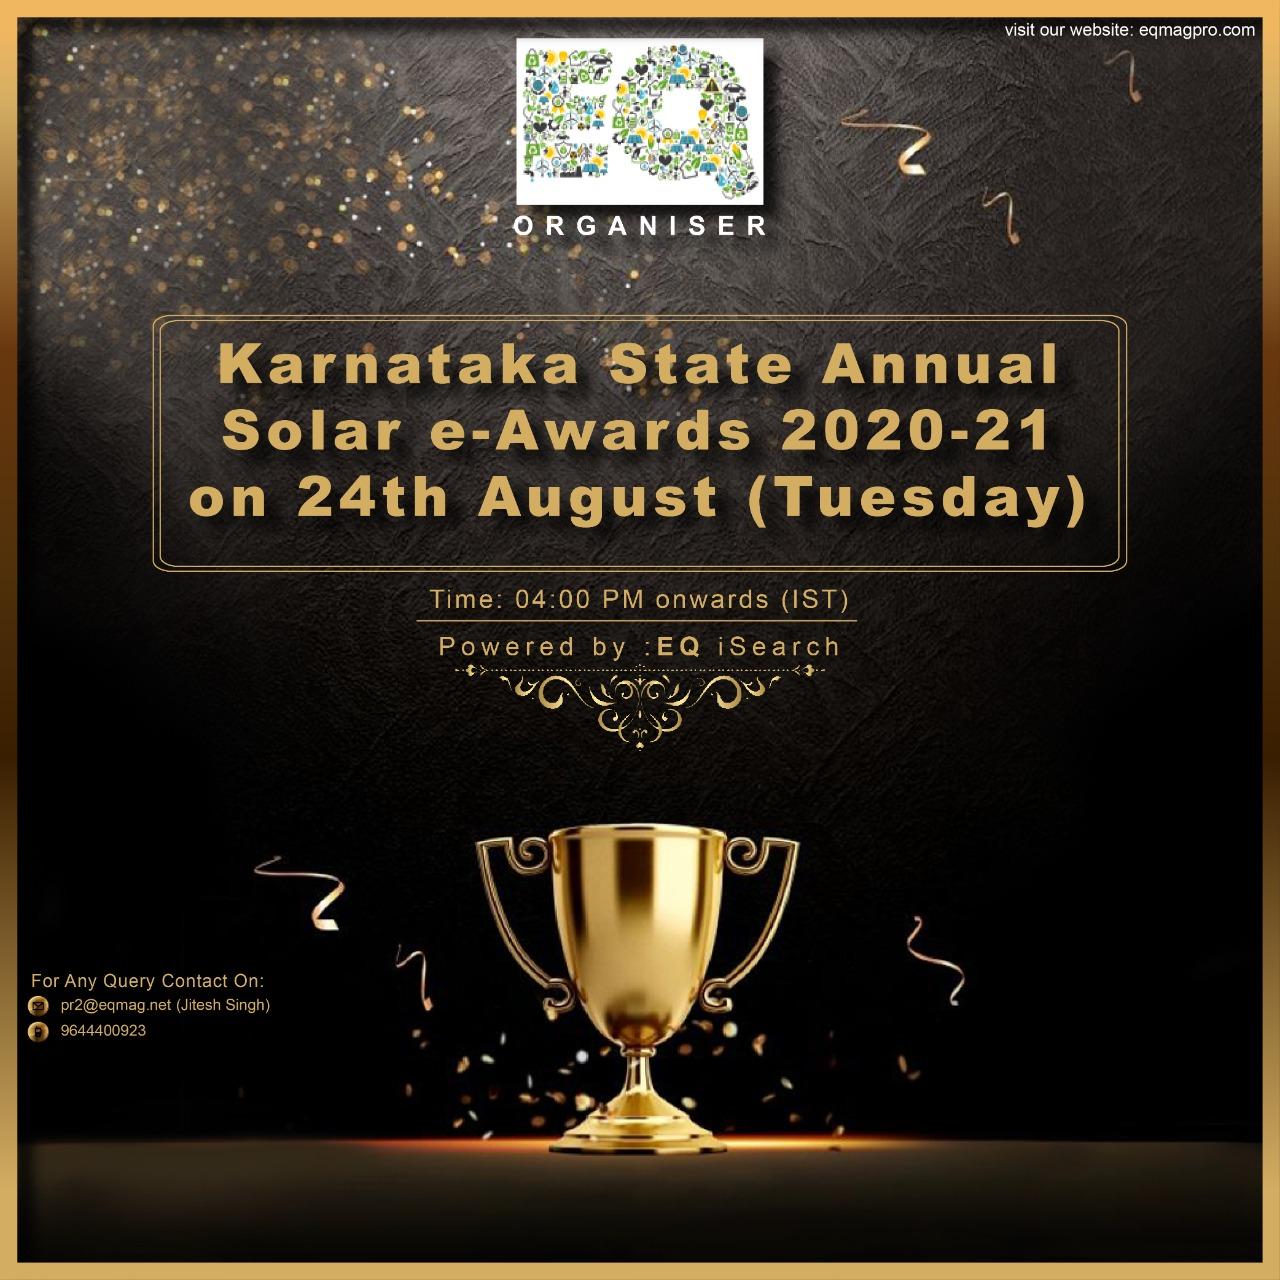 Karnataka State Annual Solar e-Awards 2020-21 Powered by EQ iSearch